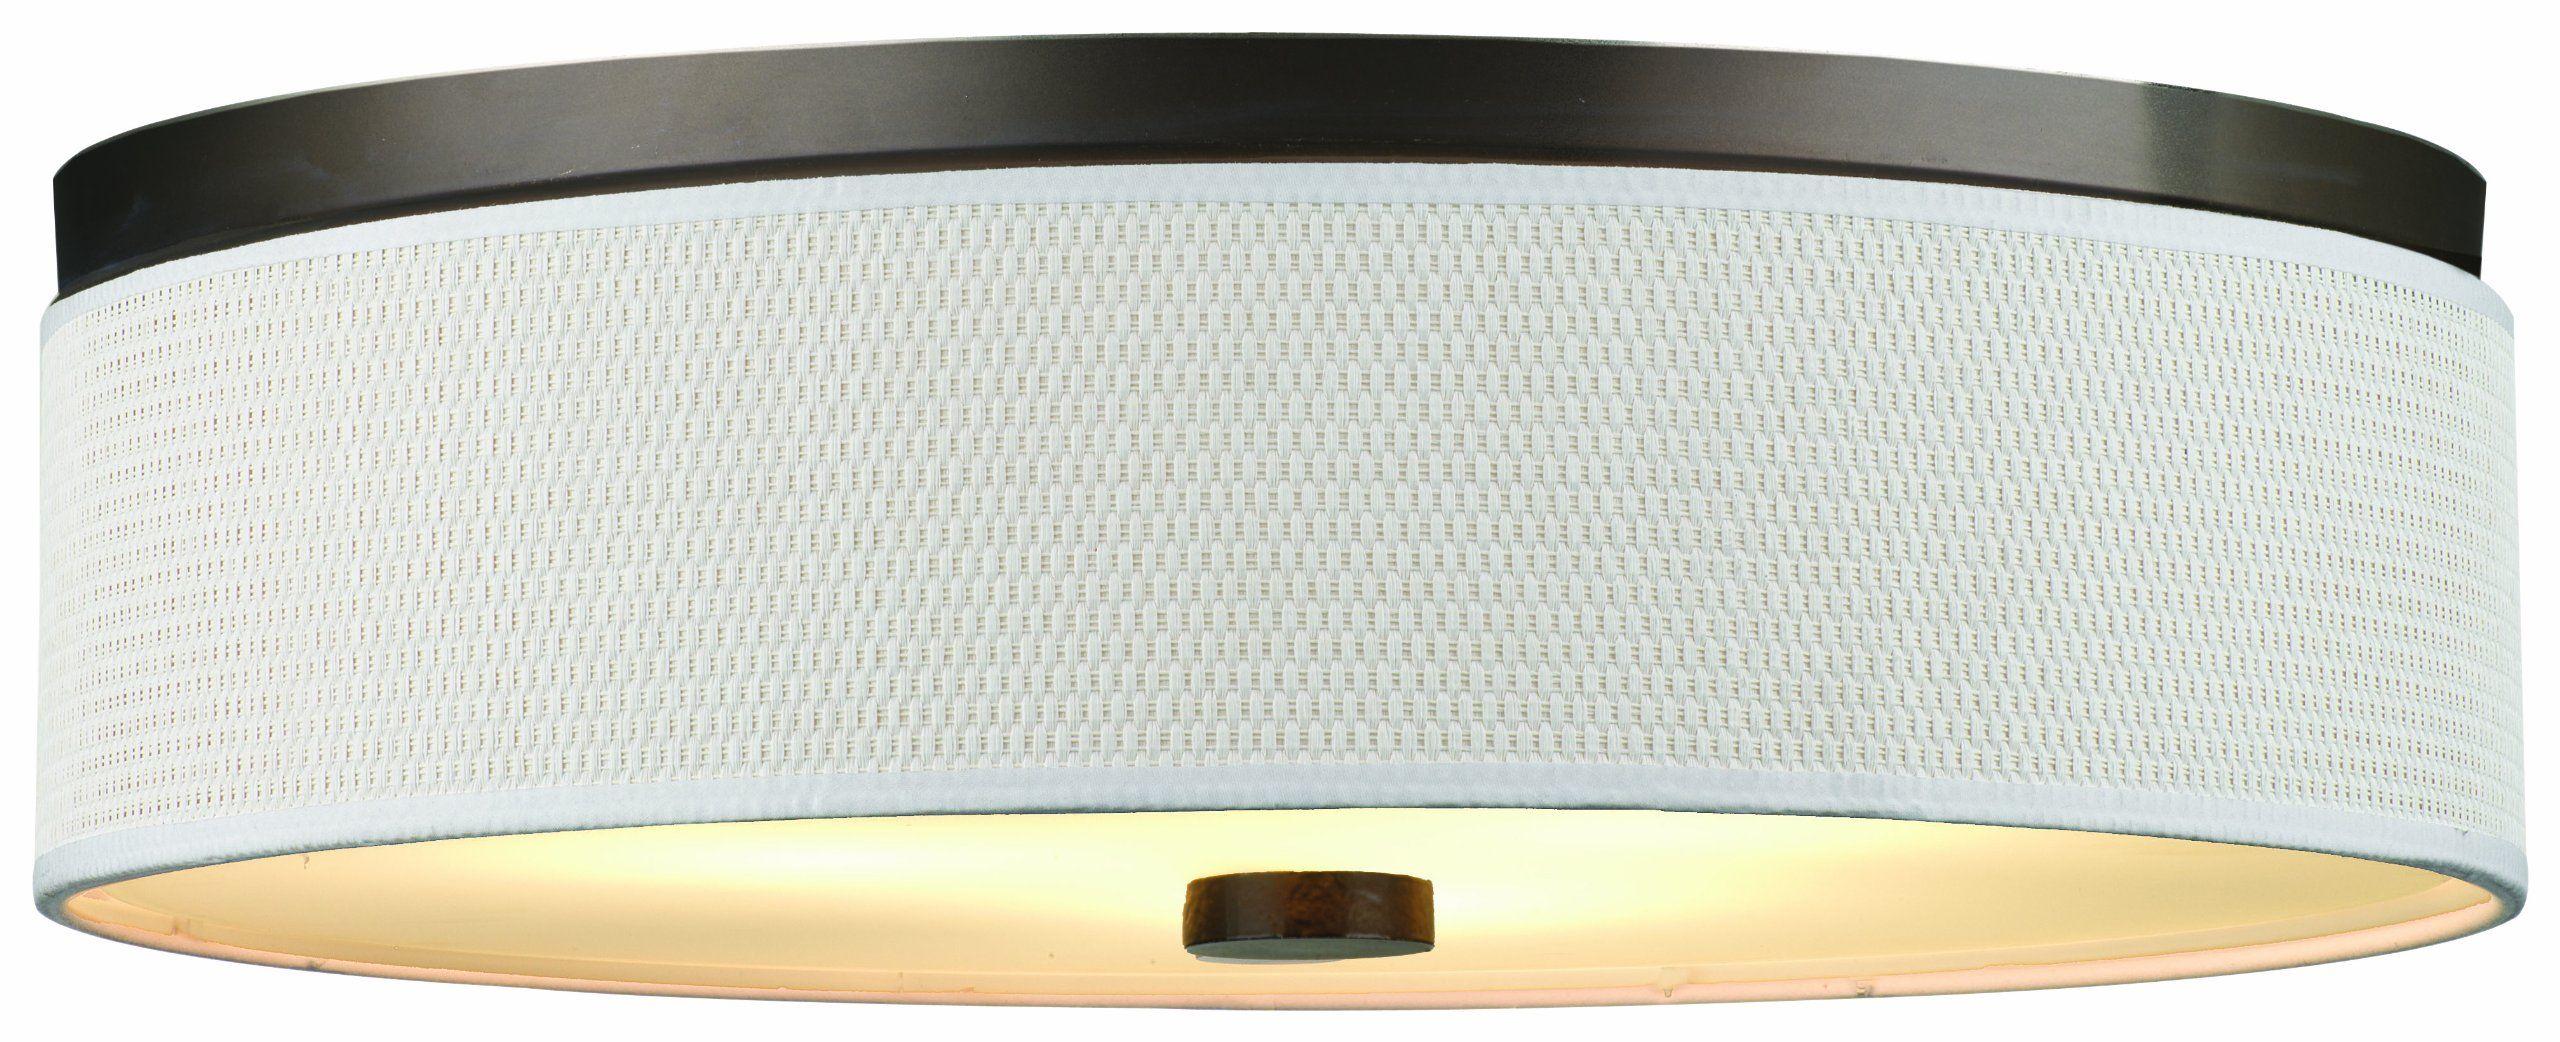 Philips Forecast F615520 Candra Ceiling Light Sorrel